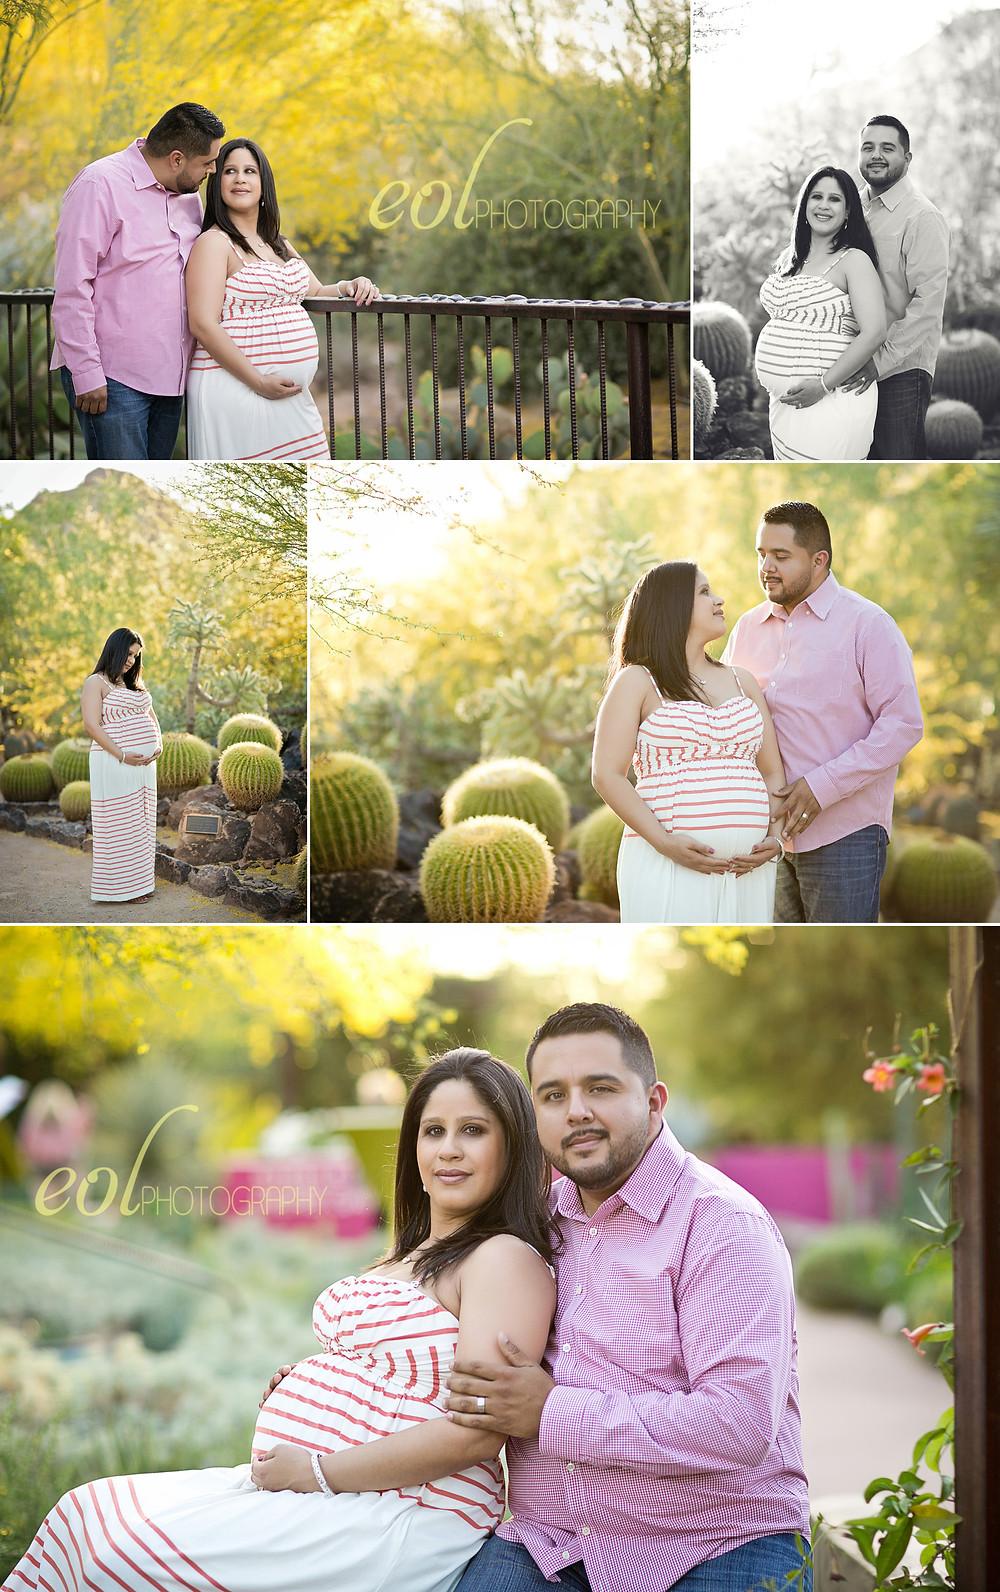 Maternity photos - yellow desert - cactus